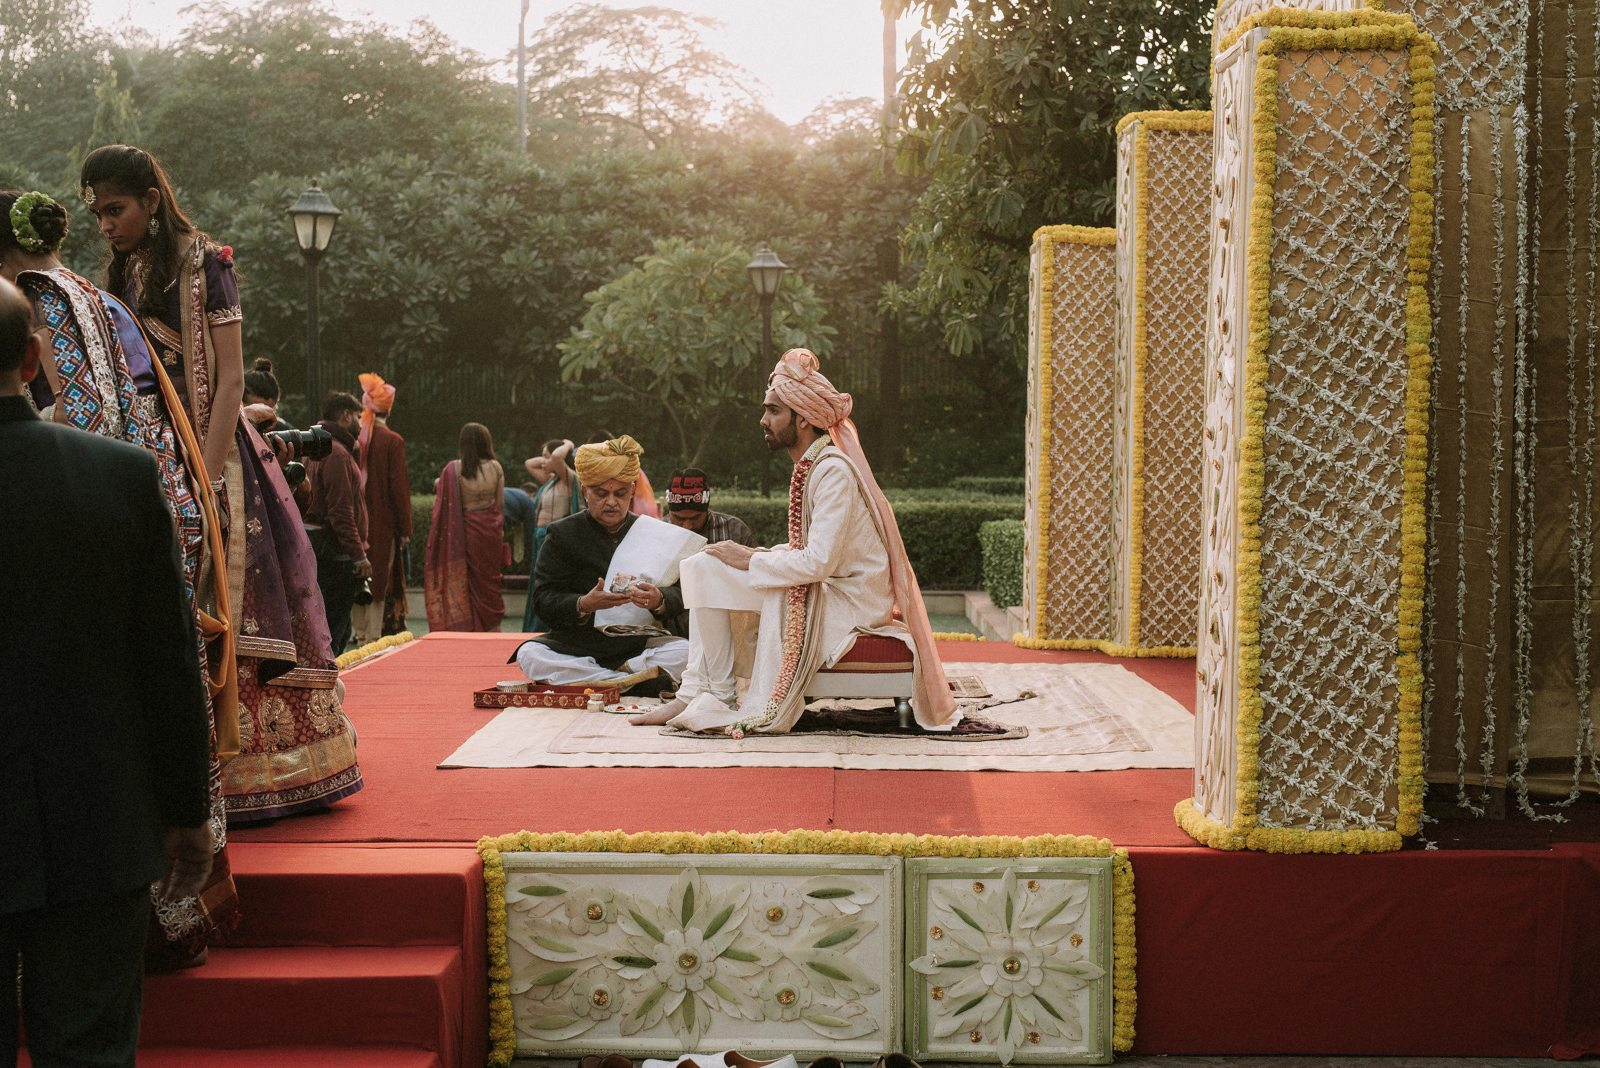 wedding in india - destination wedding photographer-201.jpg